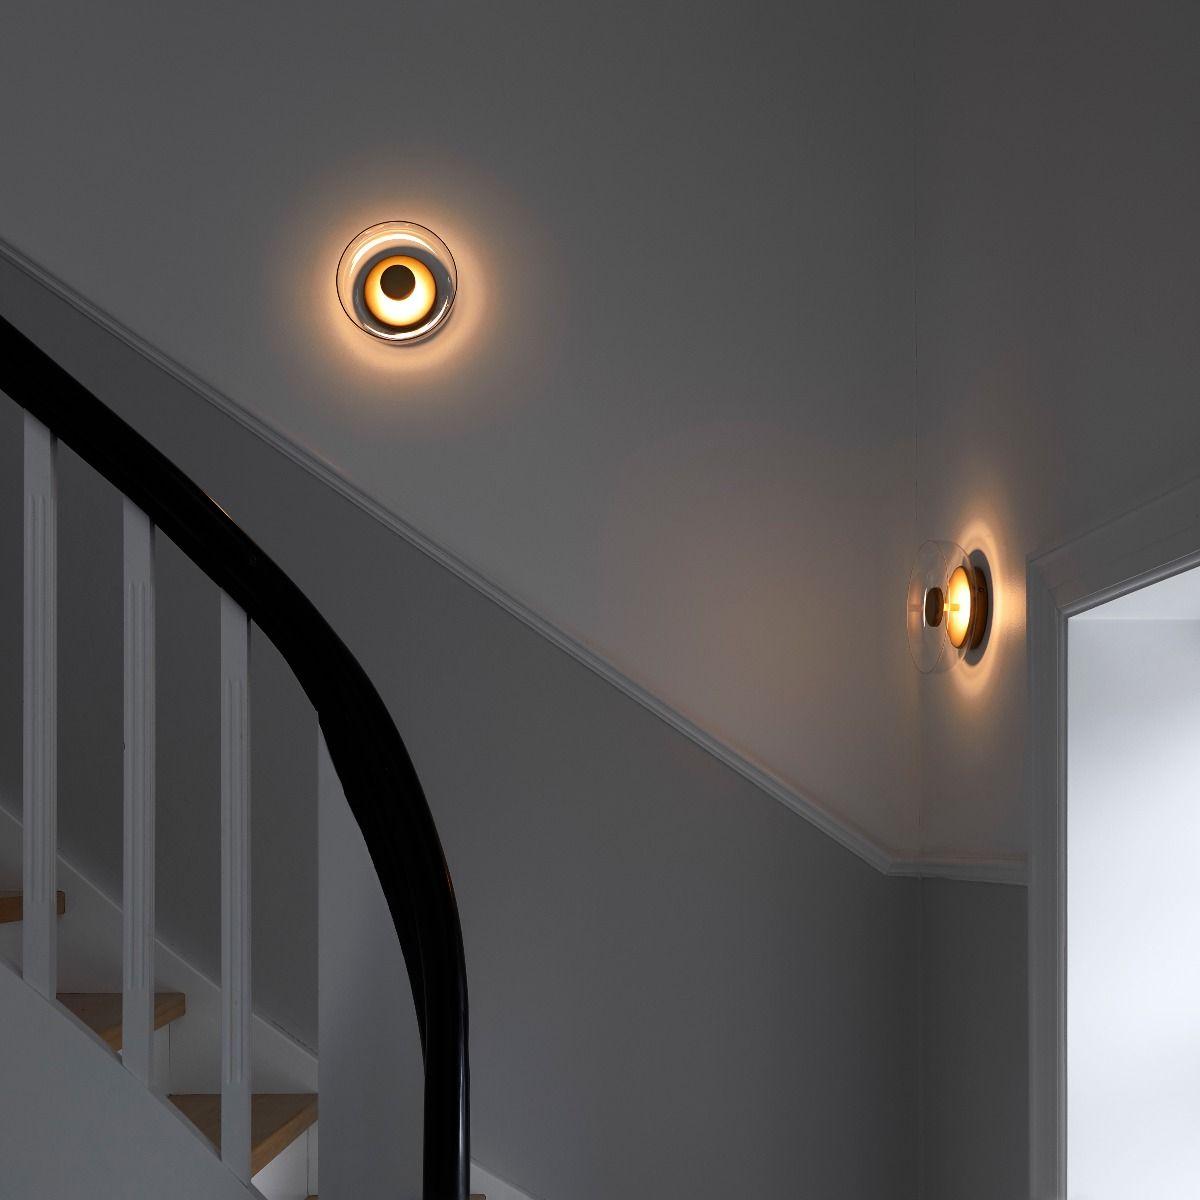 Nuura Blossi Wall Light in hall way